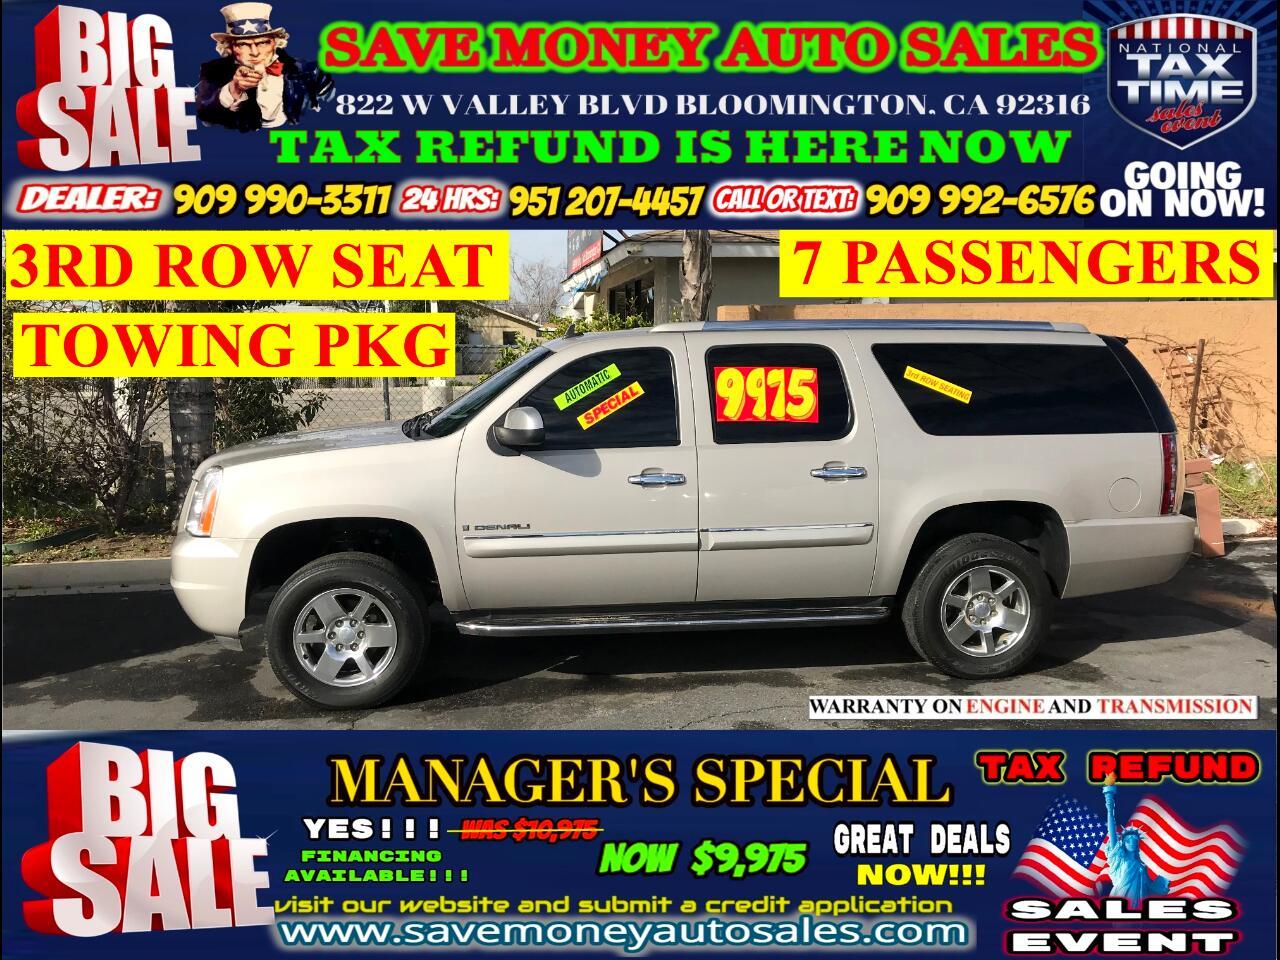 2008 GMC Yukon Denali XL AWD> 3RD ROW SEAT> TOWING PKG> FULLY LOADED